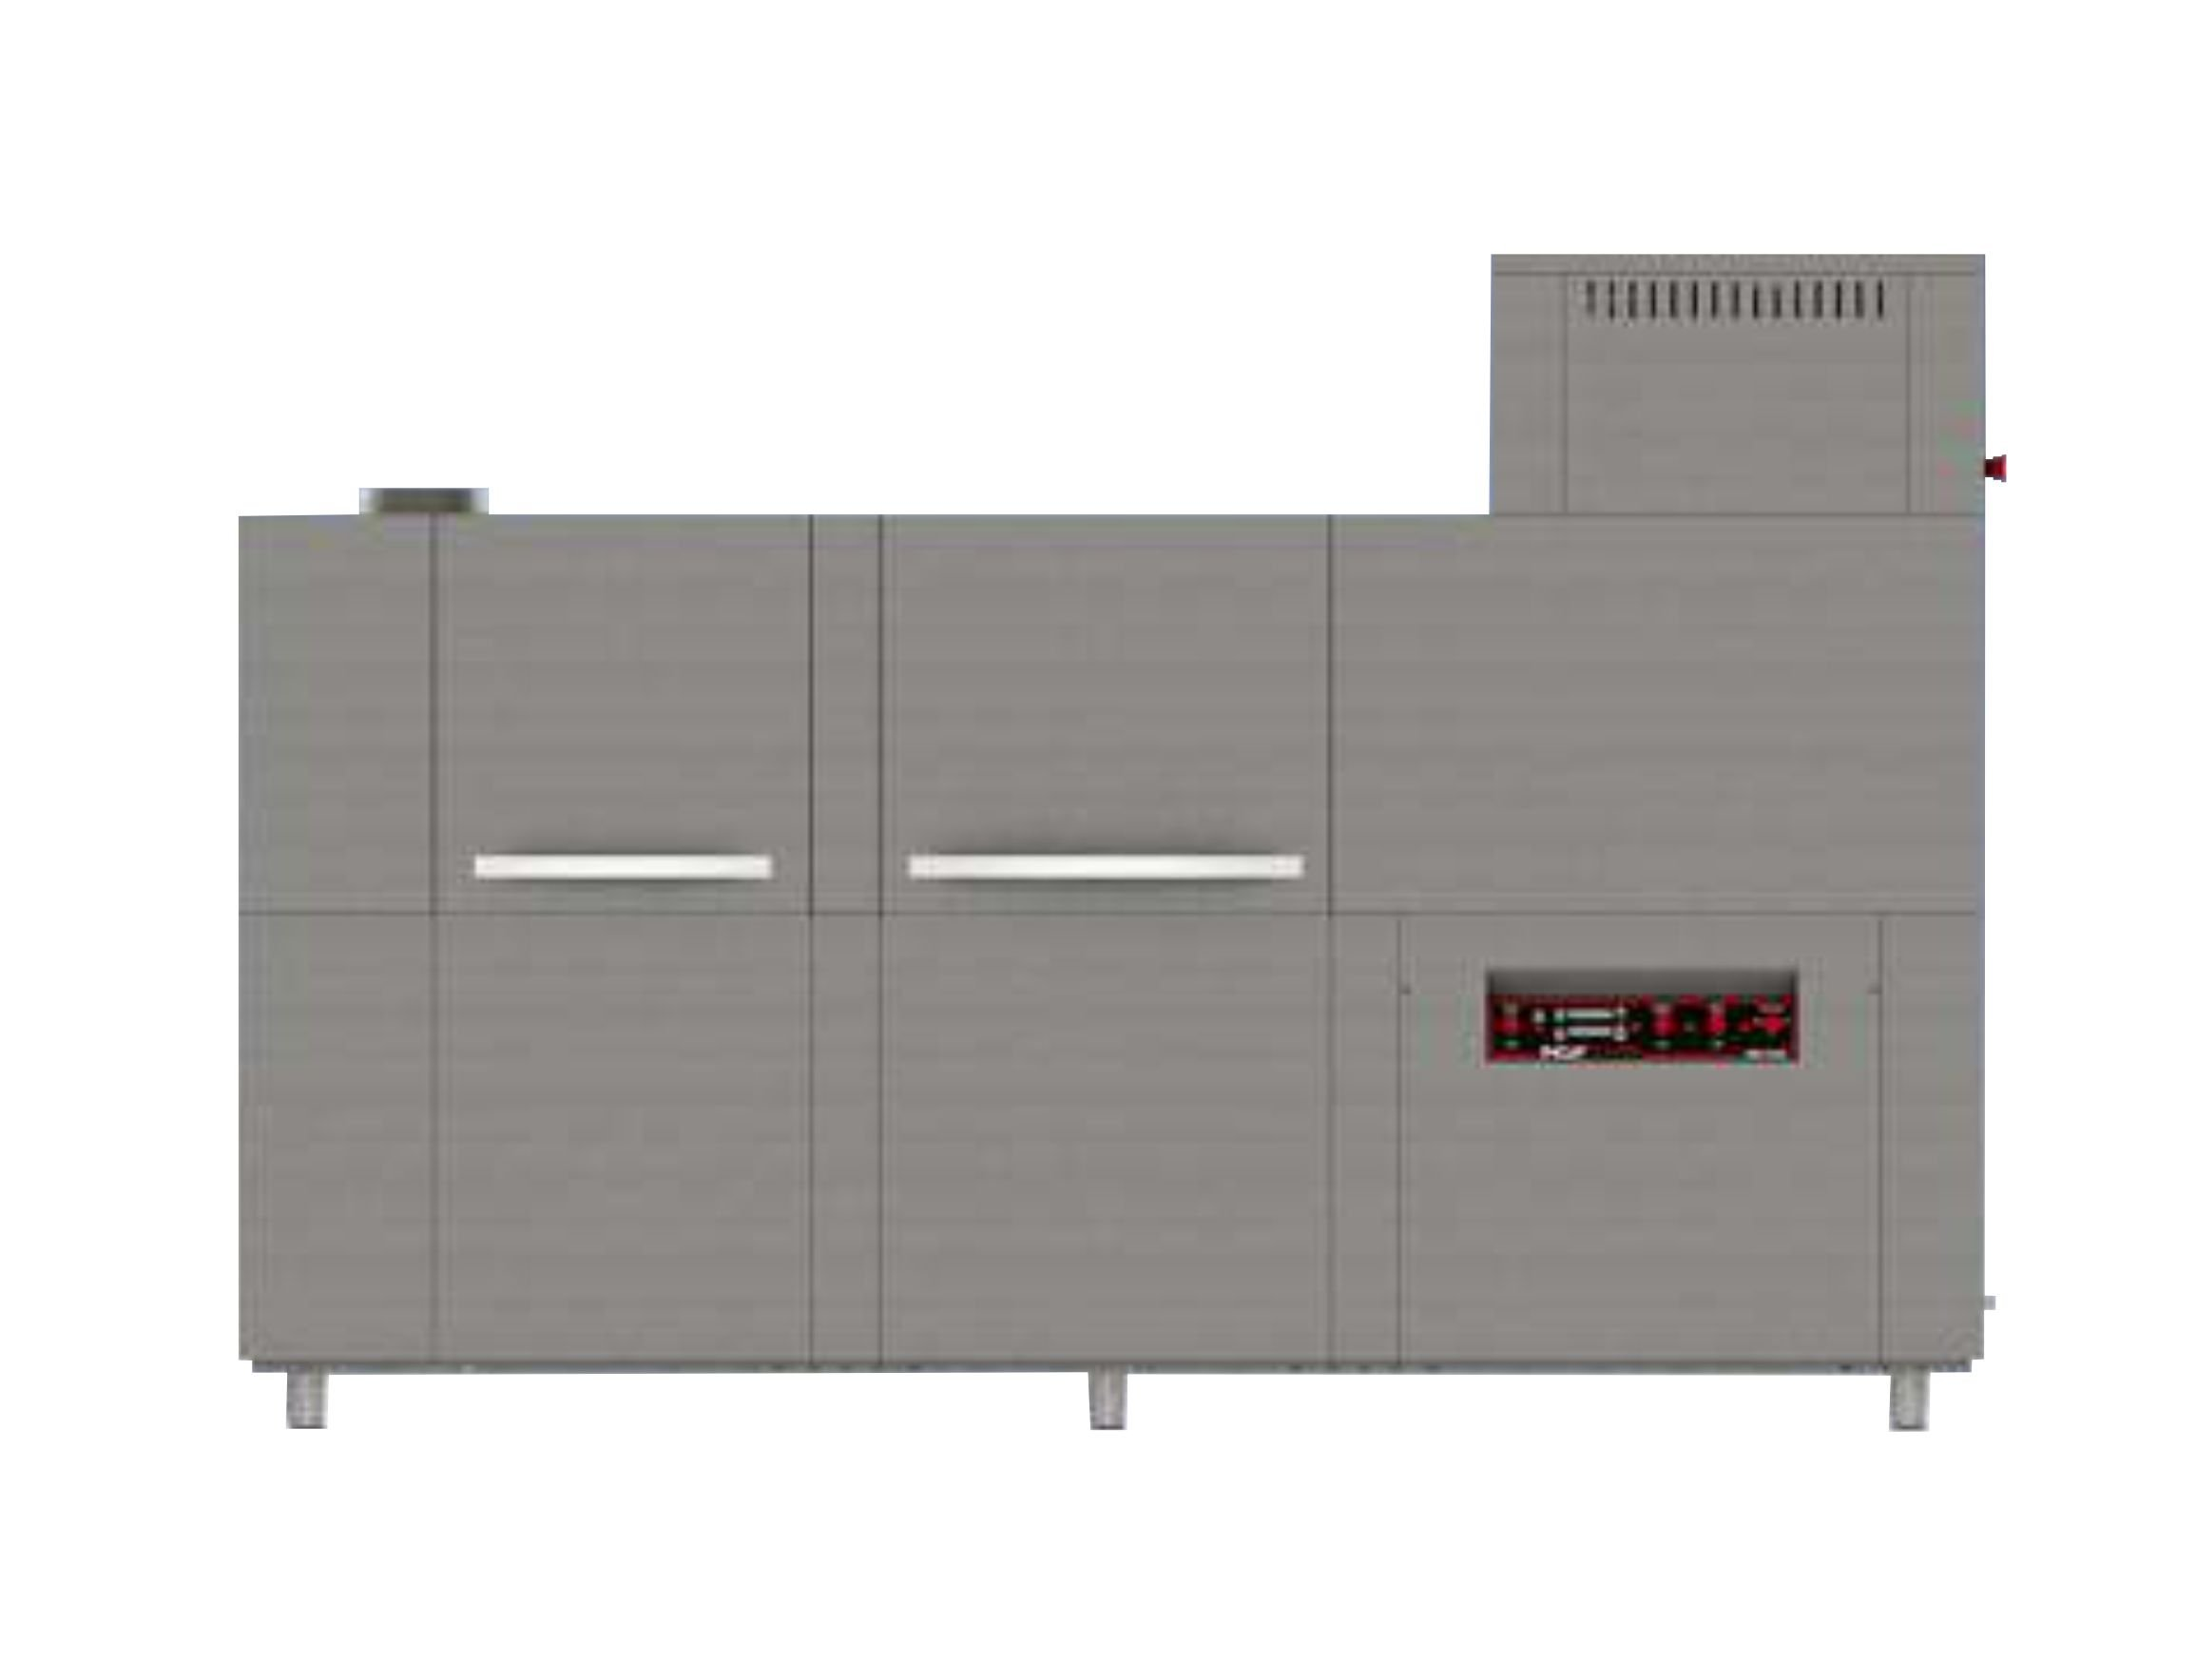 senox-icw-konveyor-bulasik-makinalari